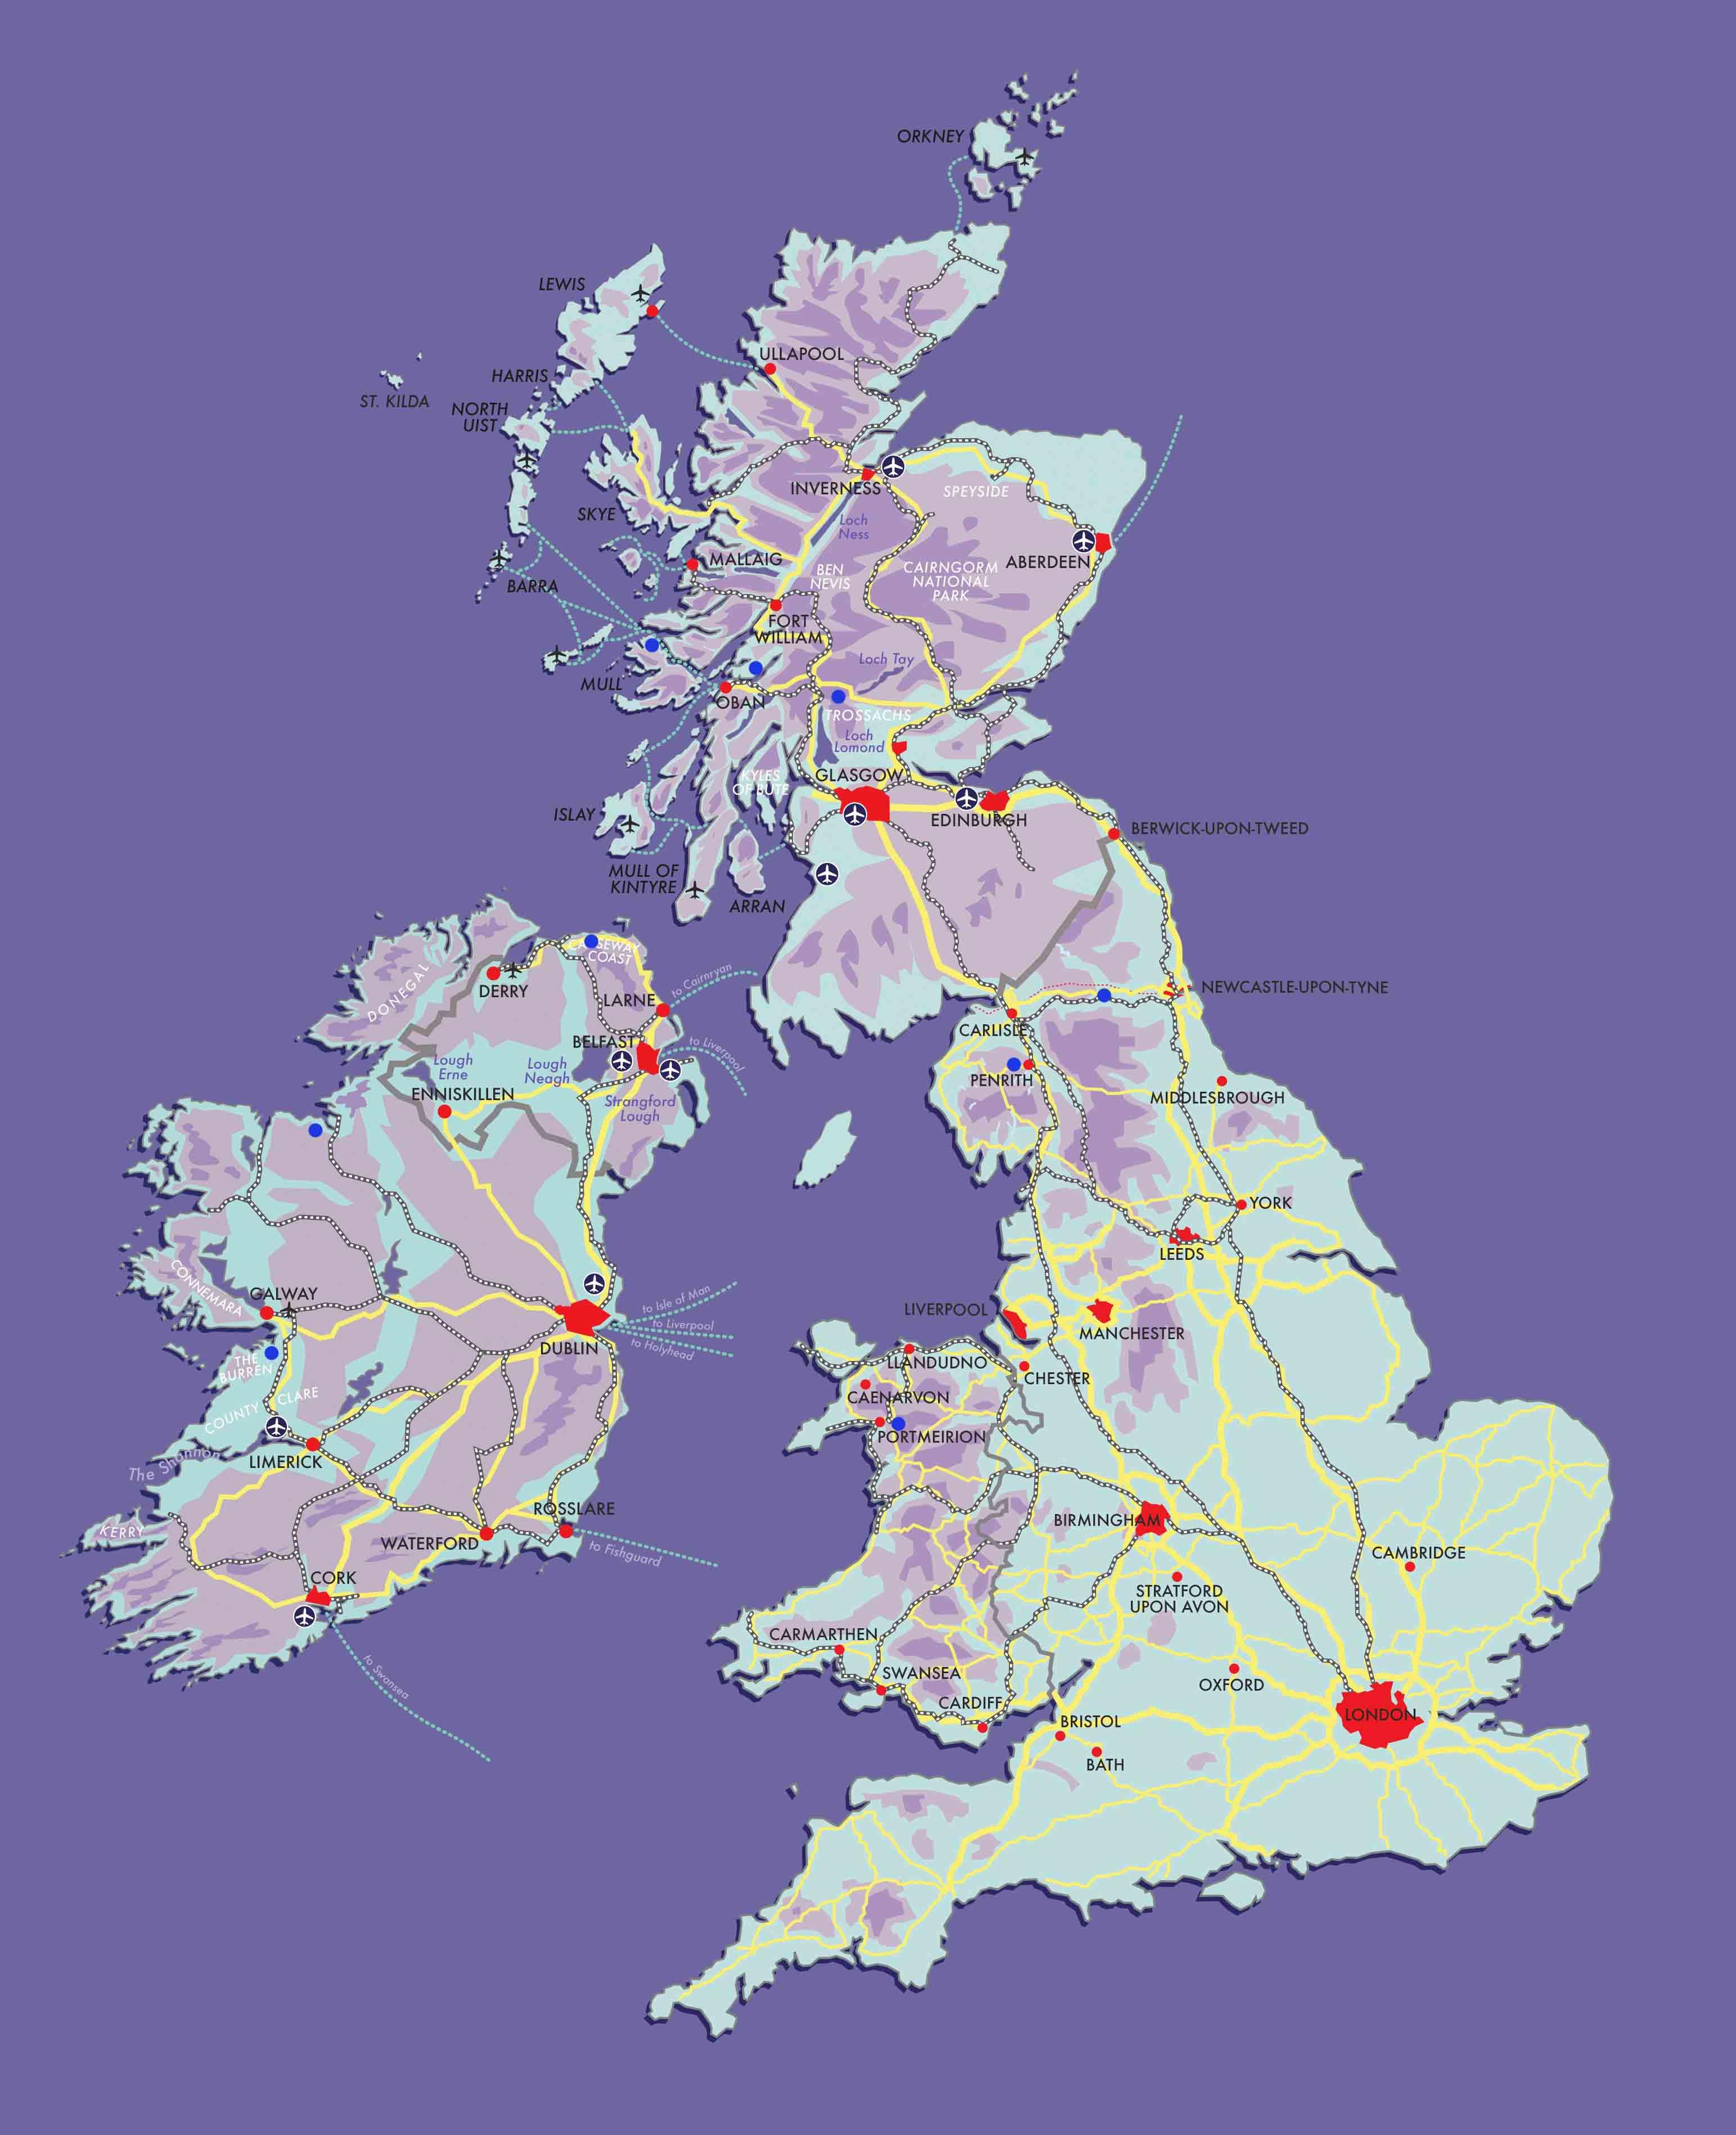 Scotland, England, Ireland, Wales